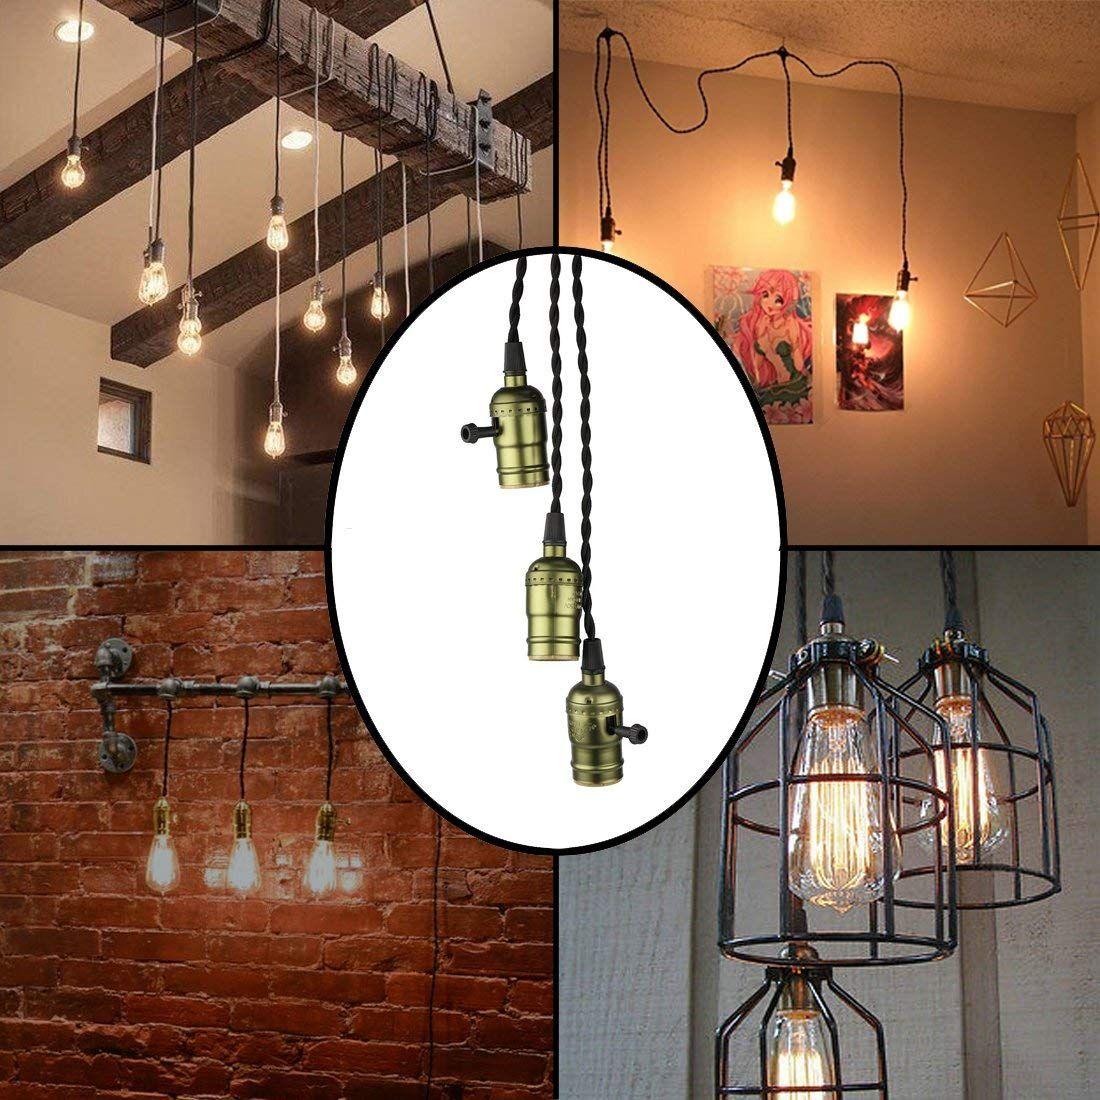 Vintage Triple Light Sockets Pendant Hanging Light Cord Kit Plug